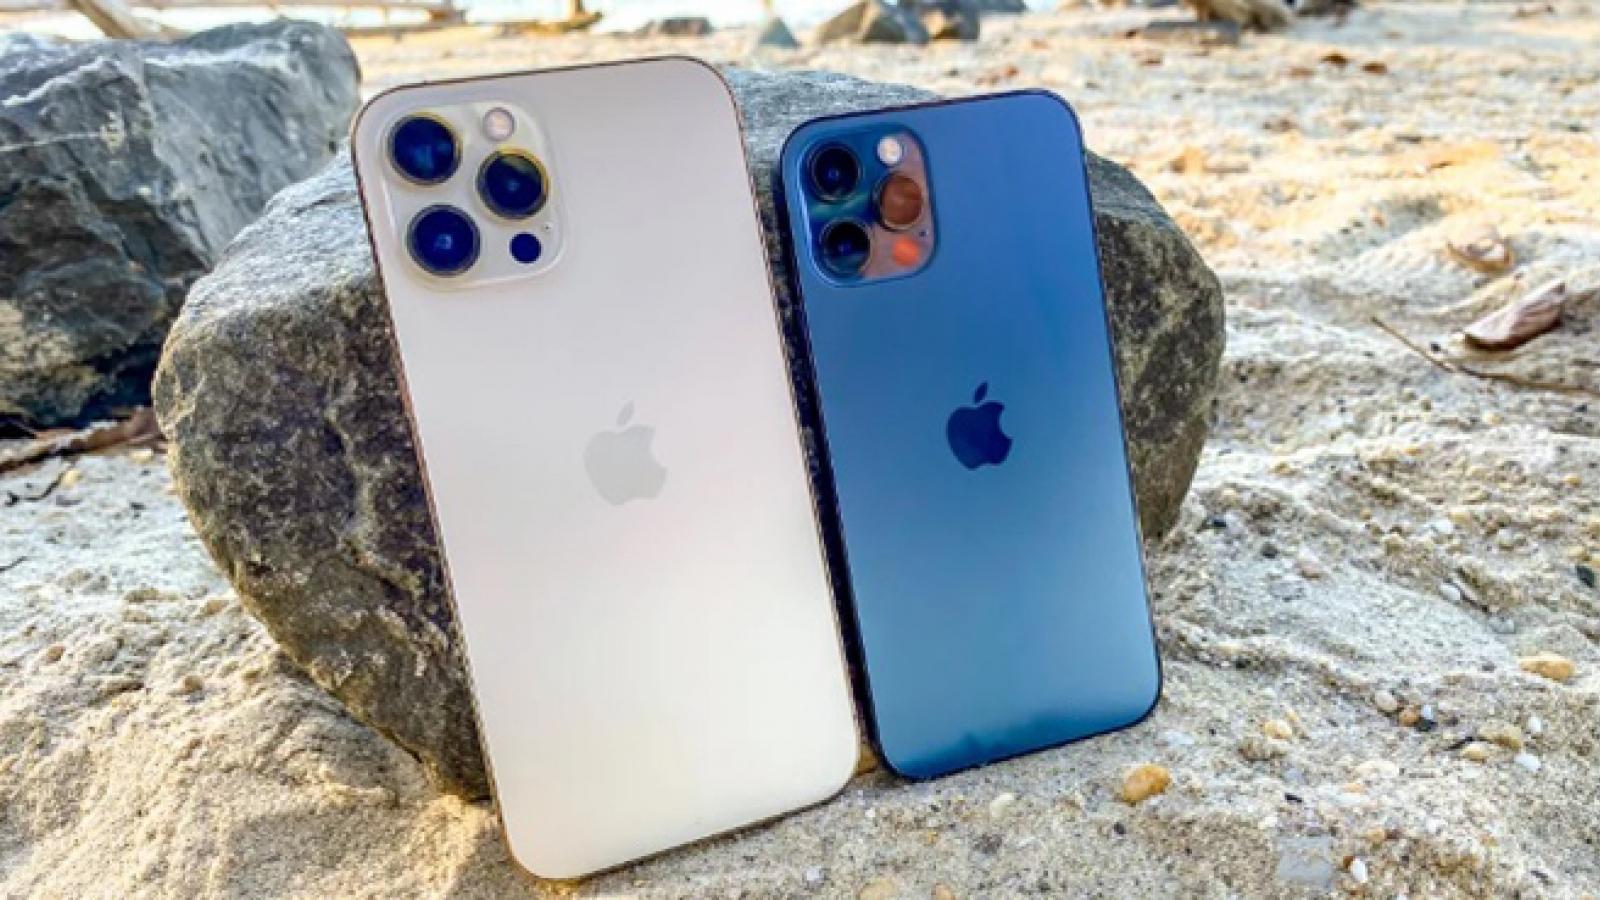 iFan nên chờ iPhone 13 hay mua luôn iPhone 12?